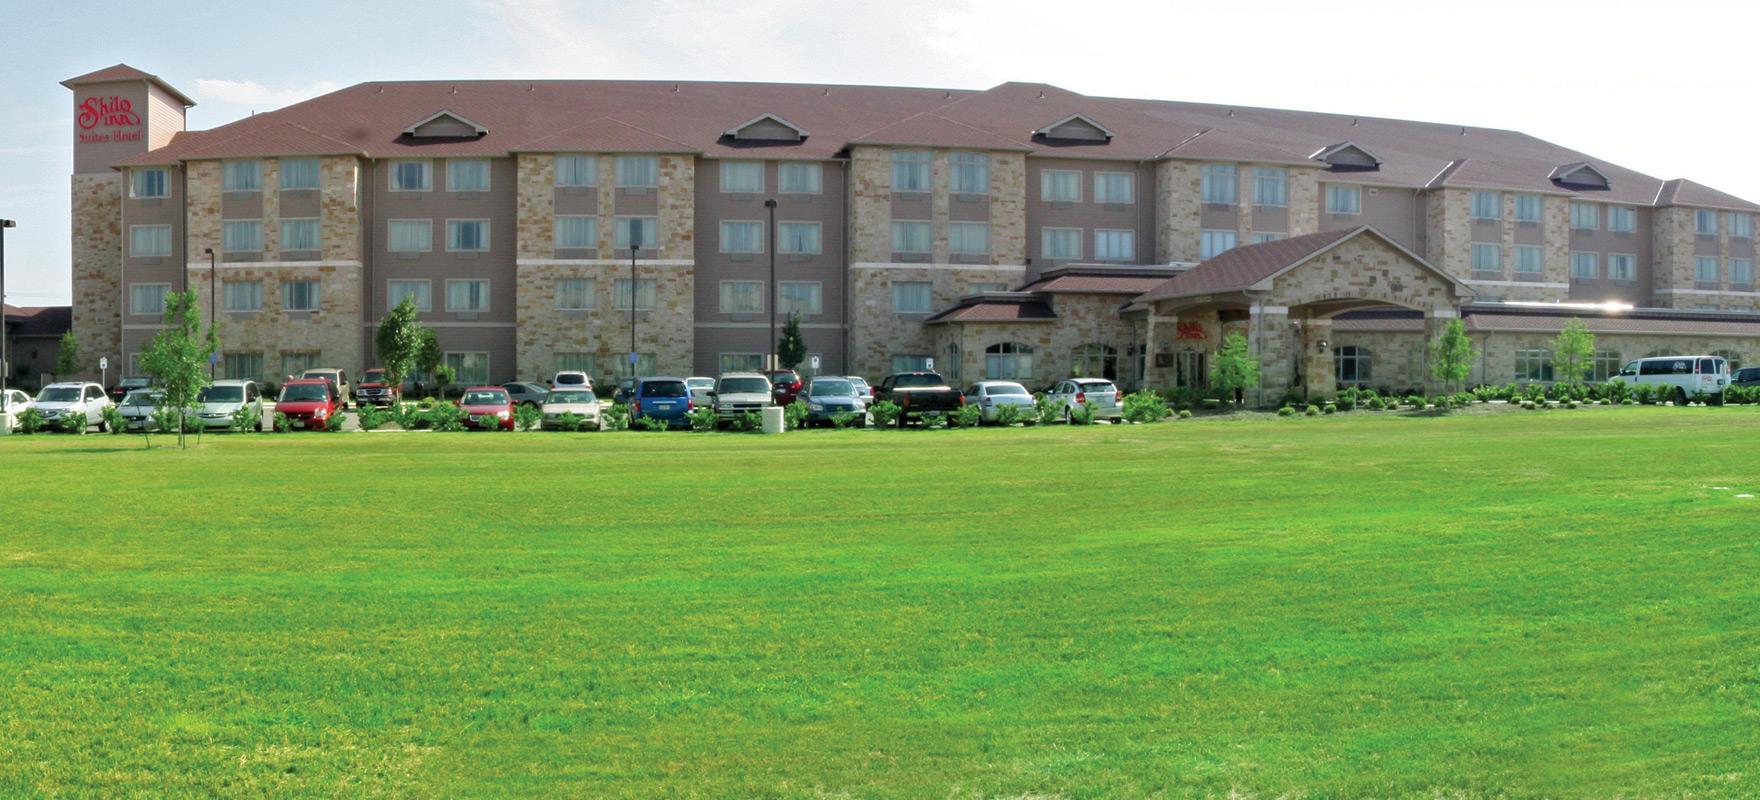 Shilo Inns Suites Hotels Killeen Texas